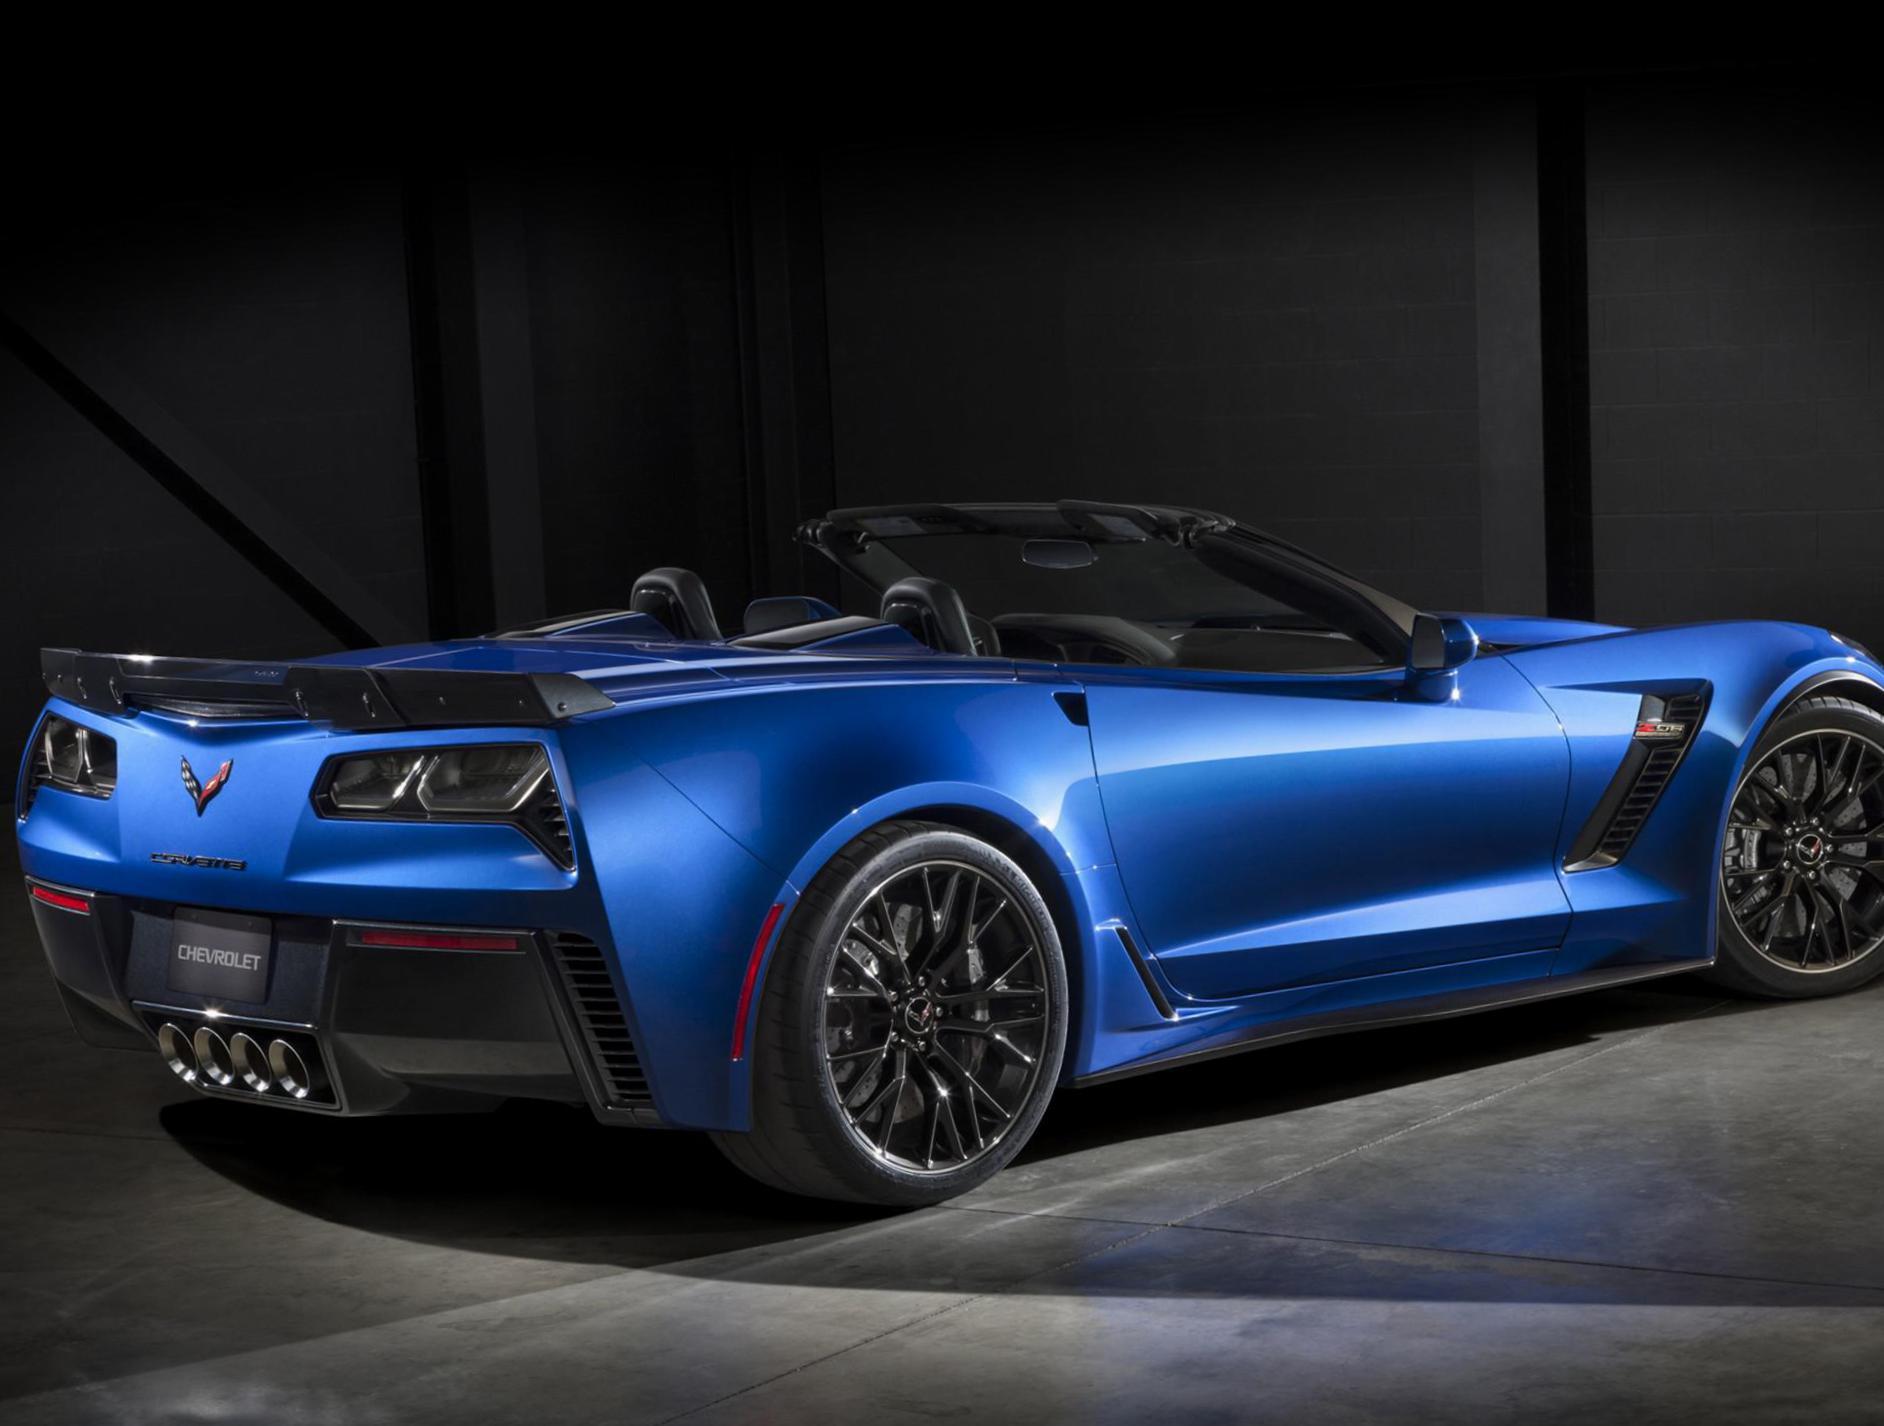 Chevrolet Corvette Stingray Convertible s and Specs